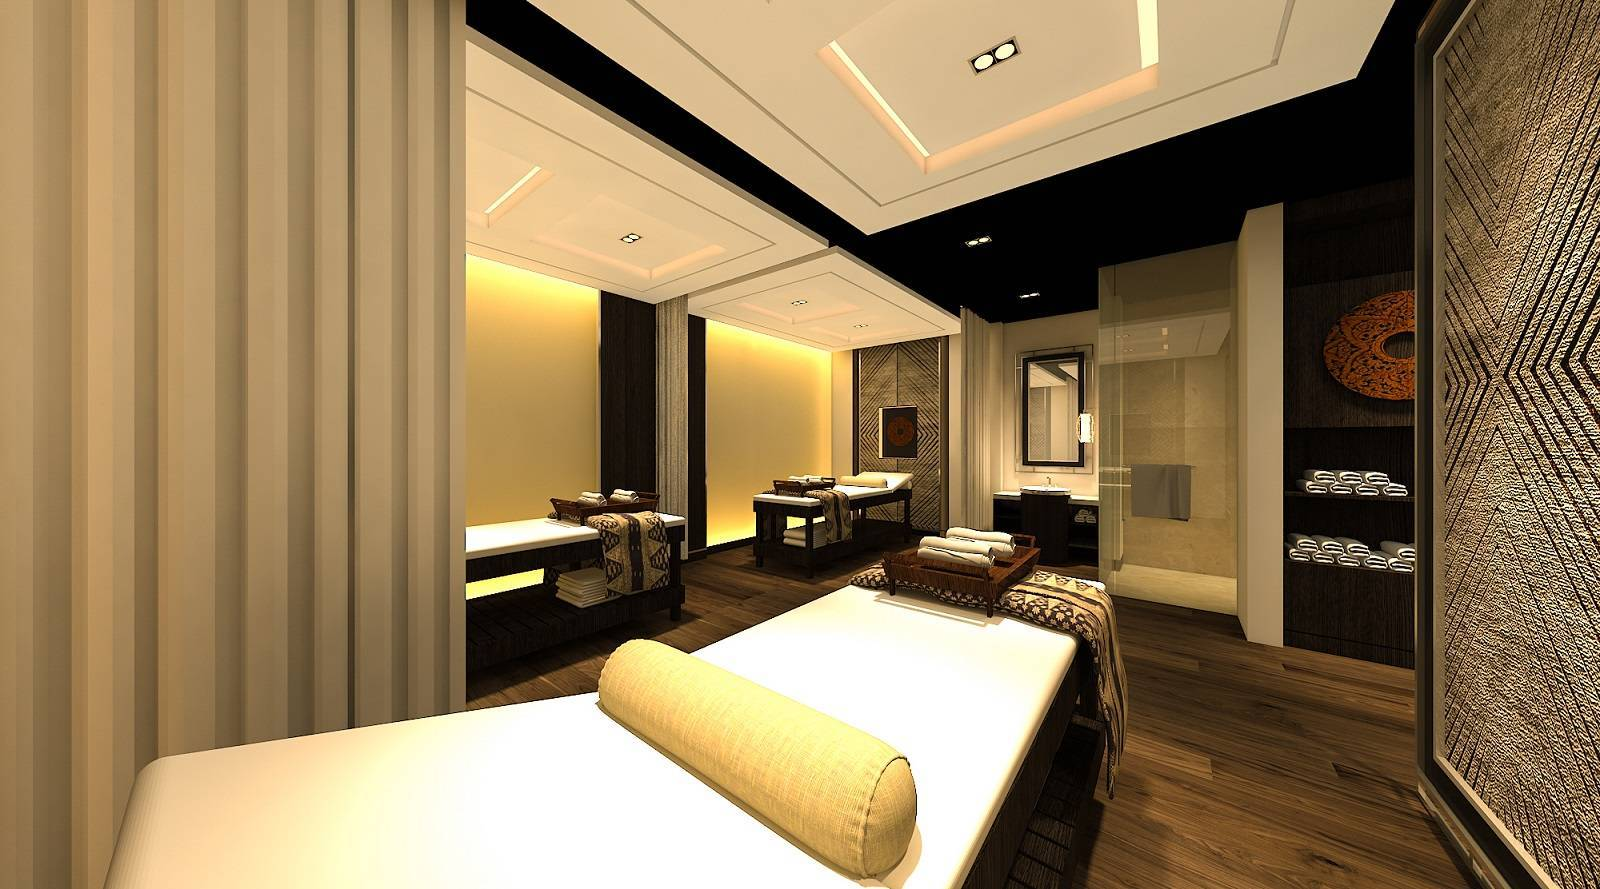 Pt. Daa Interplan Indonesia Spa At V Hotel Bandung, Indonesia Bandung, Indonesia Spa-Room-View-1 Kontemporer  7131